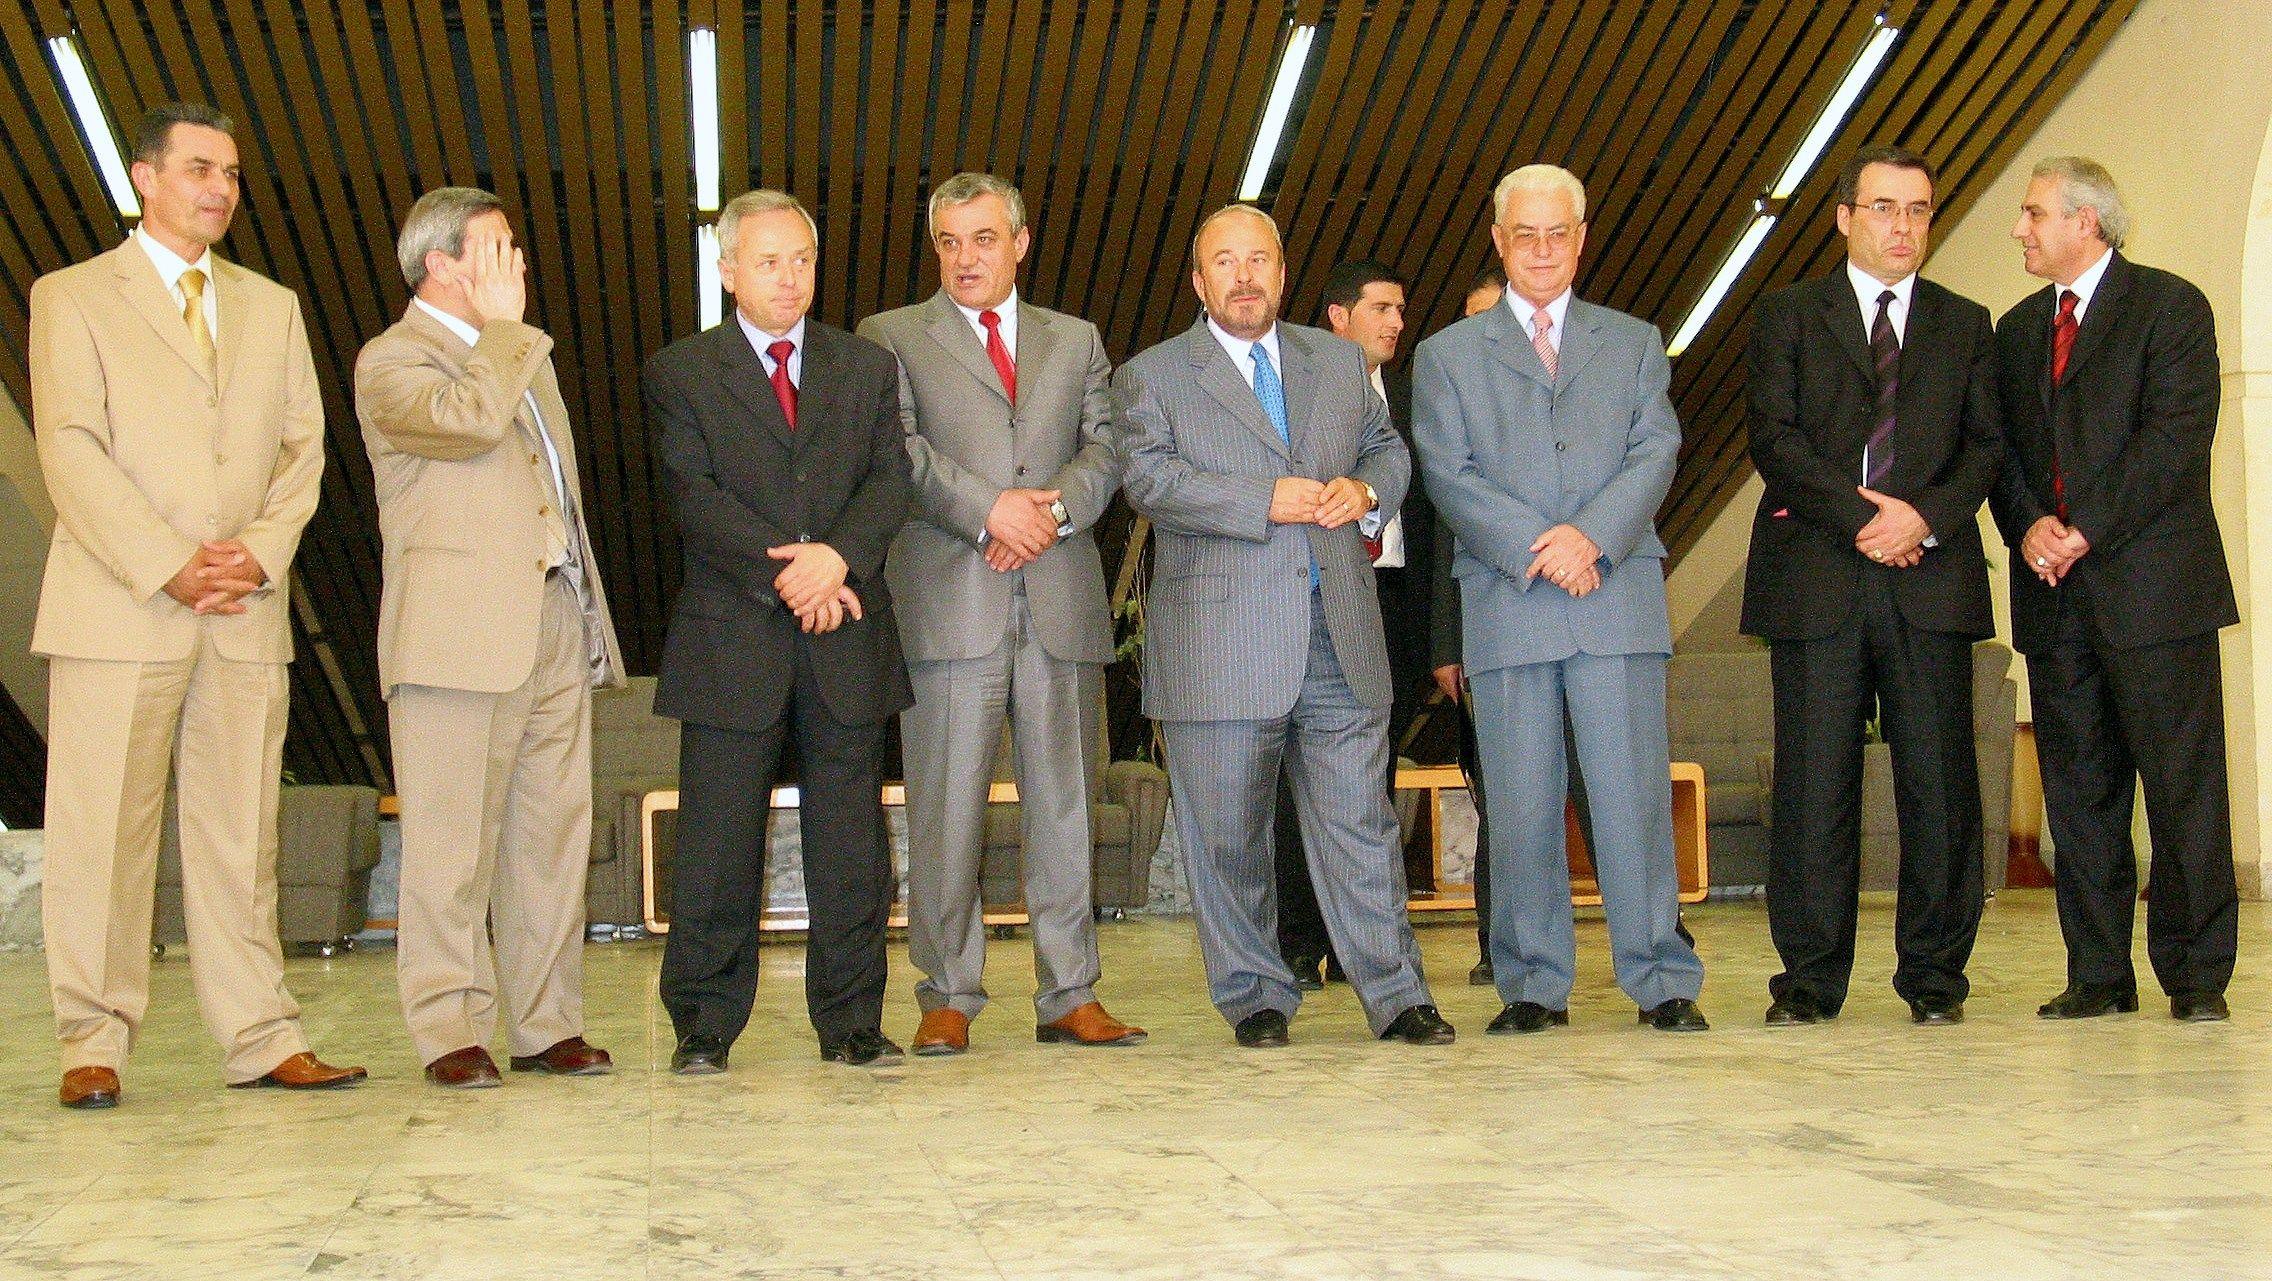 Fatos Nano me Gramoz Ruci,Namik Dokle,Servrt Pellumbi,Elmaz Sherifi,Maqo Lakrori,Agron Dibra e Bardhyl Agasi.   Foto / Malton DIBRA.